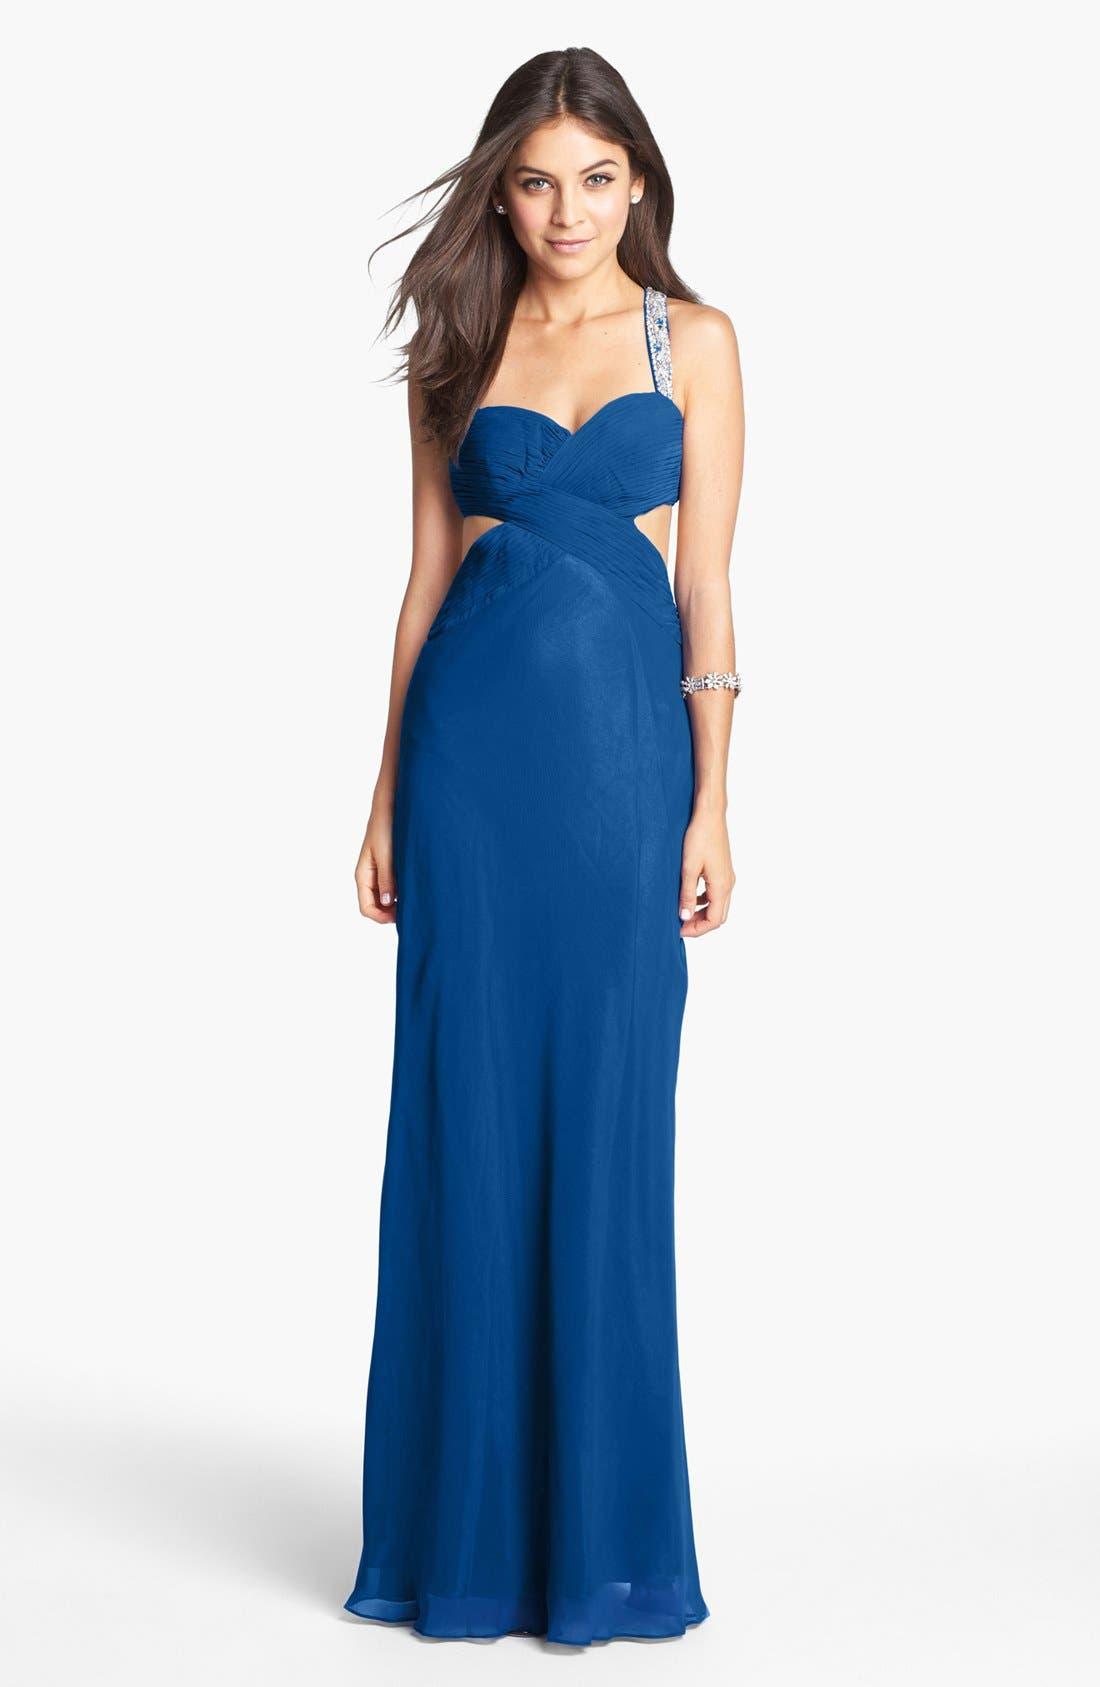 Alternate Image 1 Selected - Faviana Embellished Side Cutout Chiffon Gown